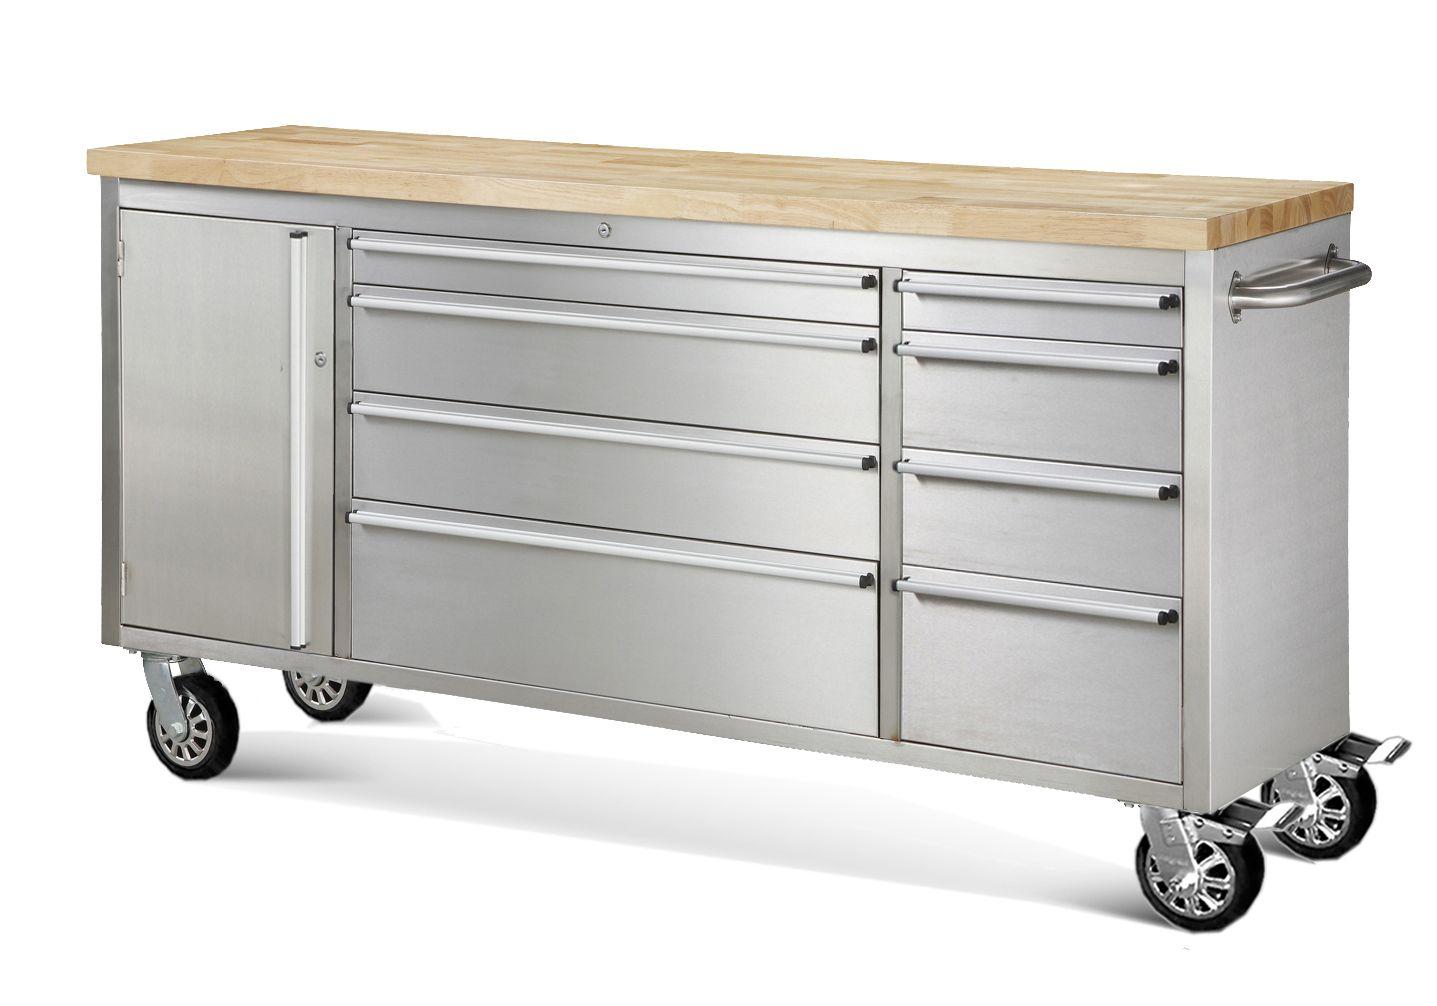 Genial 6 Foot Stainless Steel Rolling 8 Drawer Tool Box